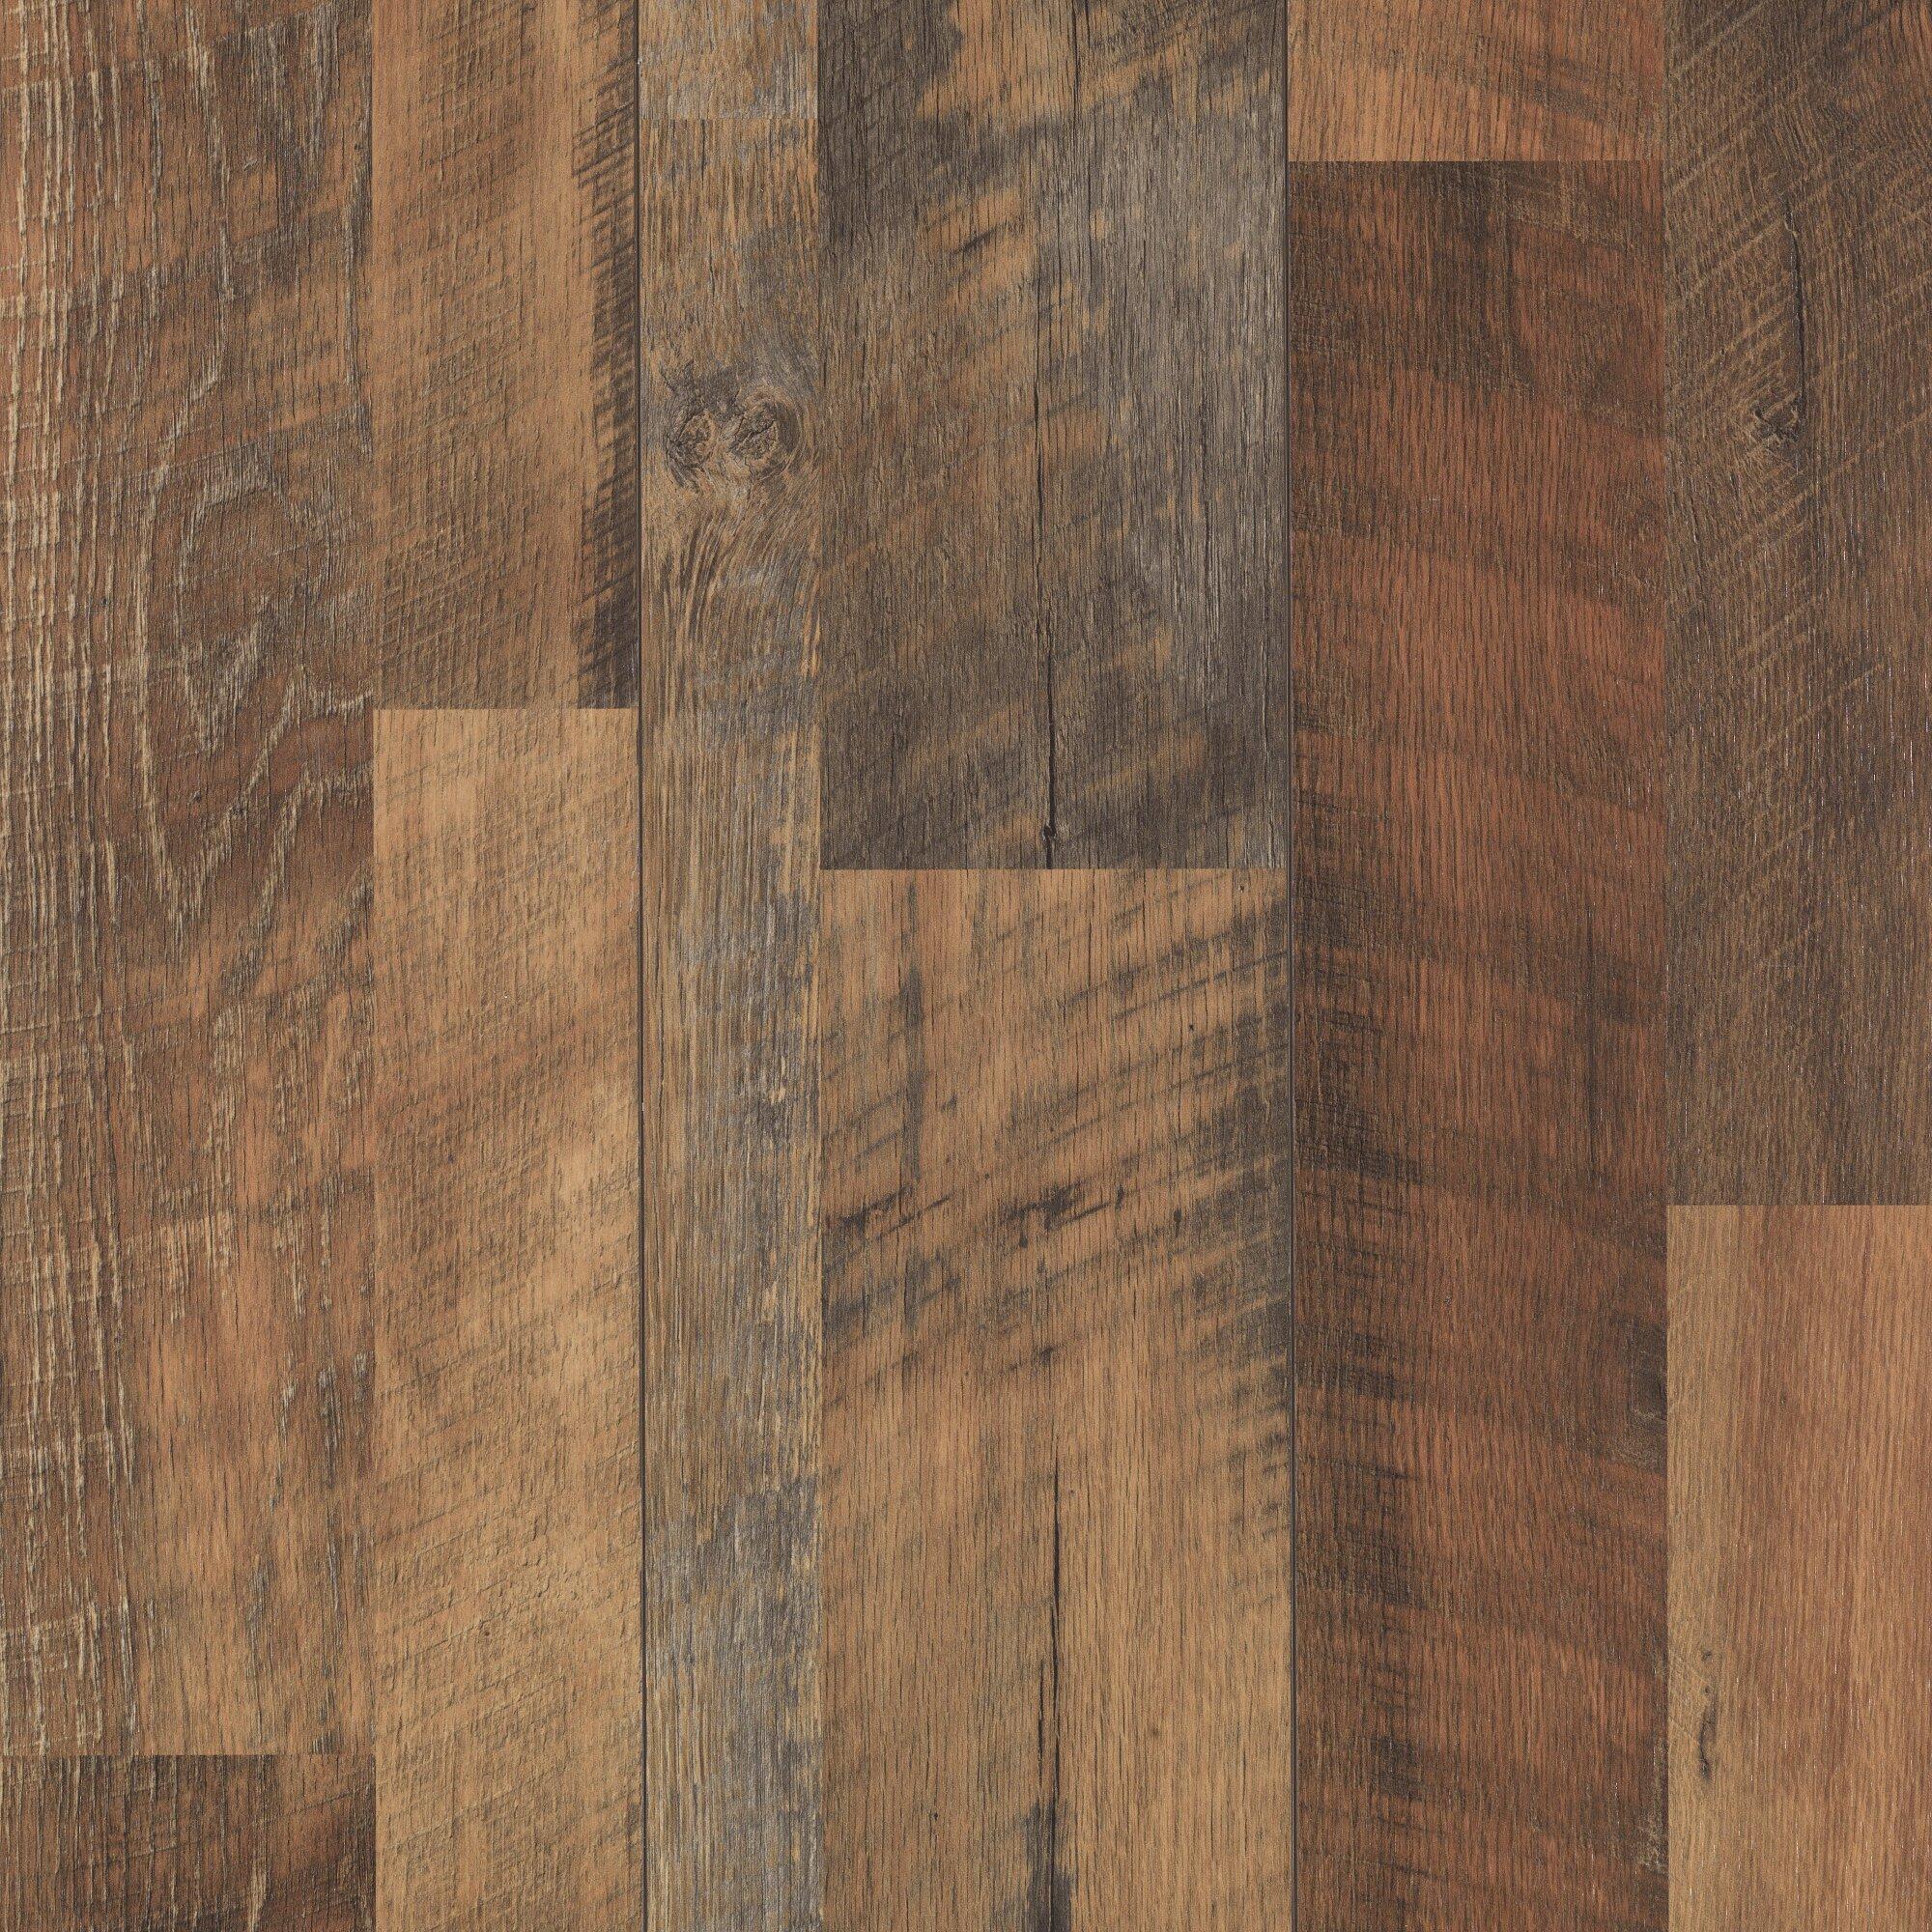 Oak Laminate Flooring project source 805 in w x 396 ft l natural oak smooth wood plank Cashe Hills 8 X 47 X 787mm Oak Laminate